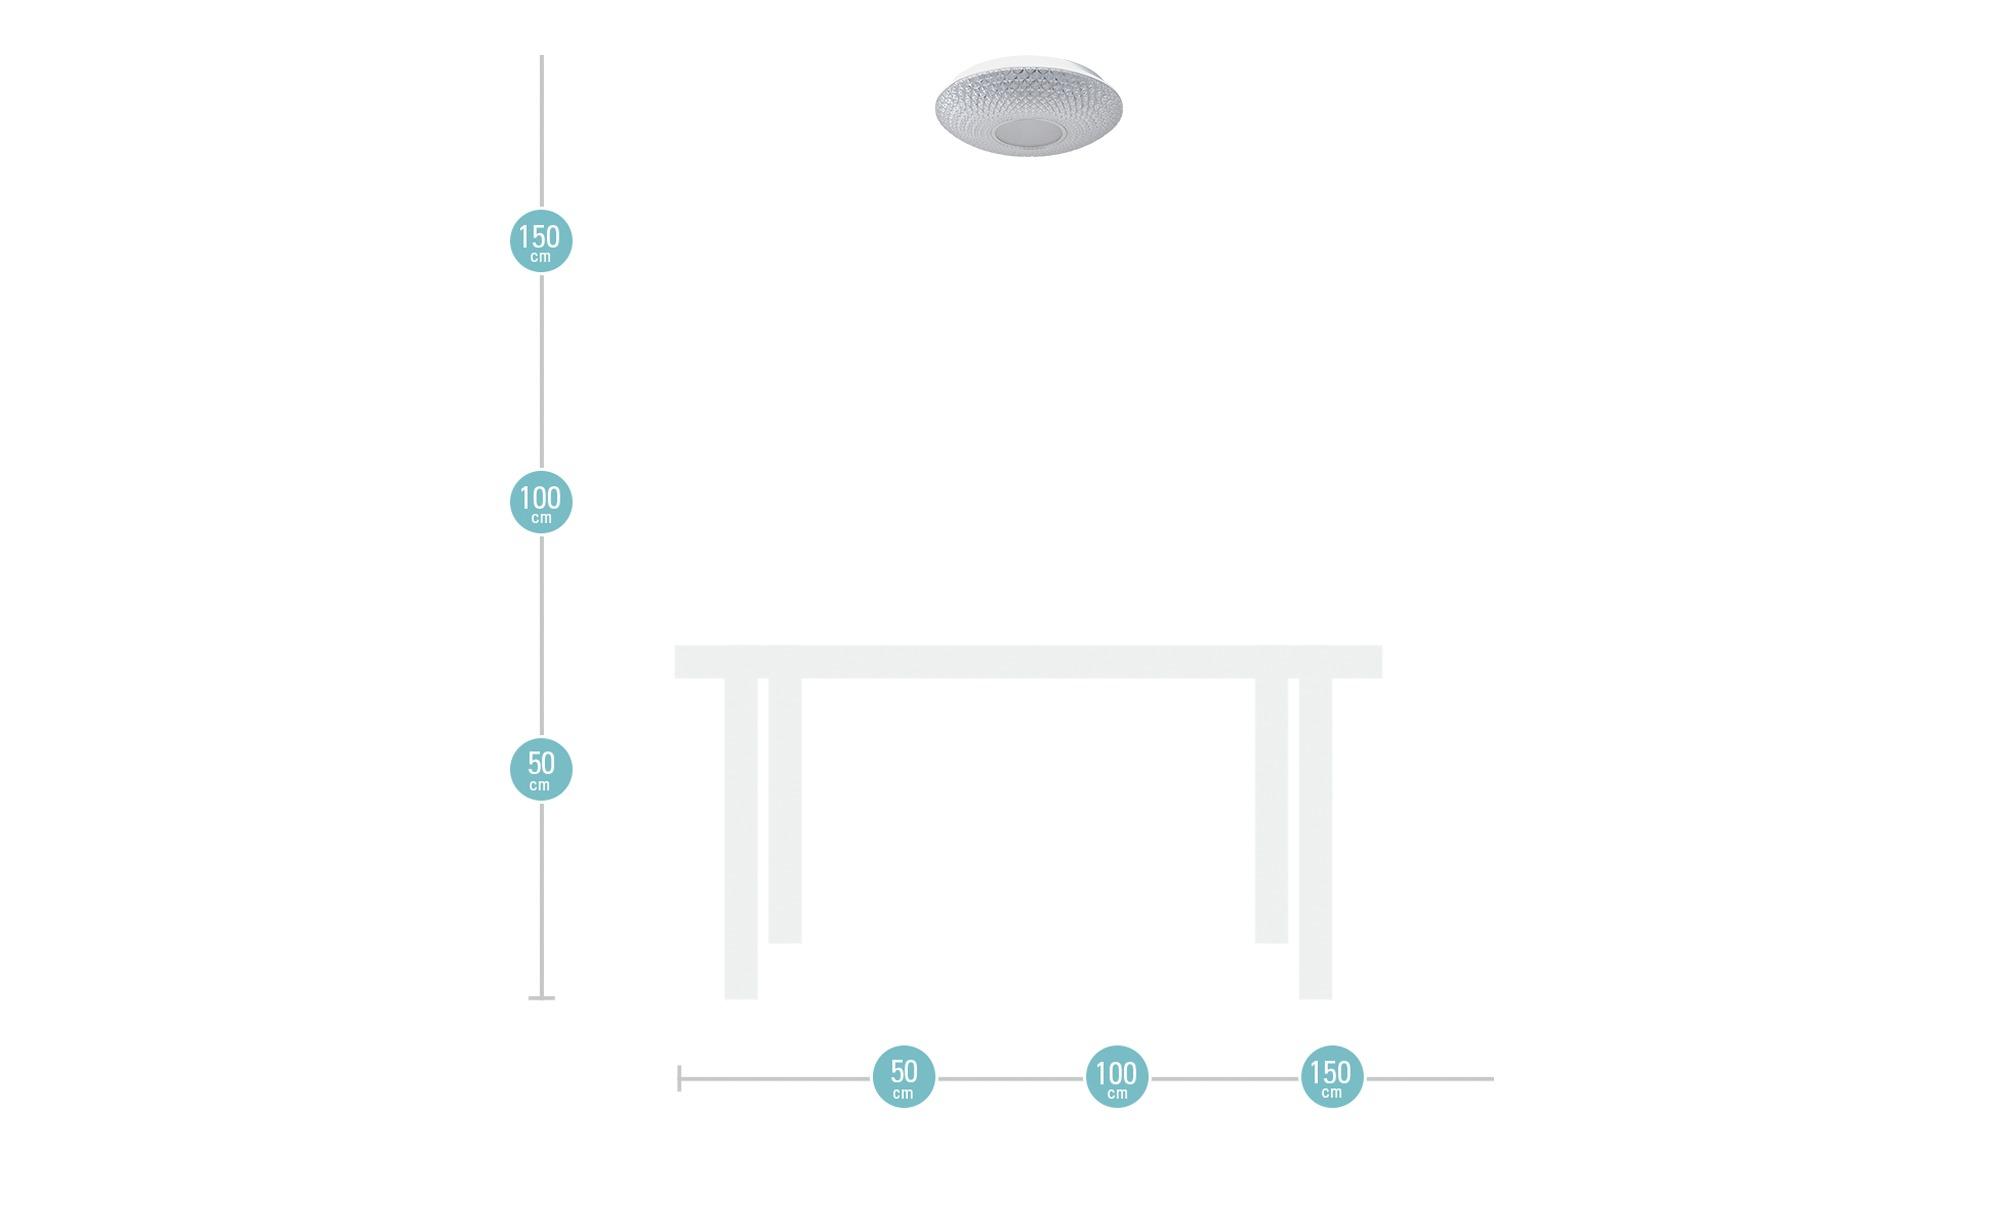 KHG LED-Deckenleuchte, Acrylglas in Kristalloptik ¦ transparent/klar ¦ Maße (cm): H: 10 Ø: 41 Lampen & Leuchten > Innenleuchten > Deckenleuchten - Höffner